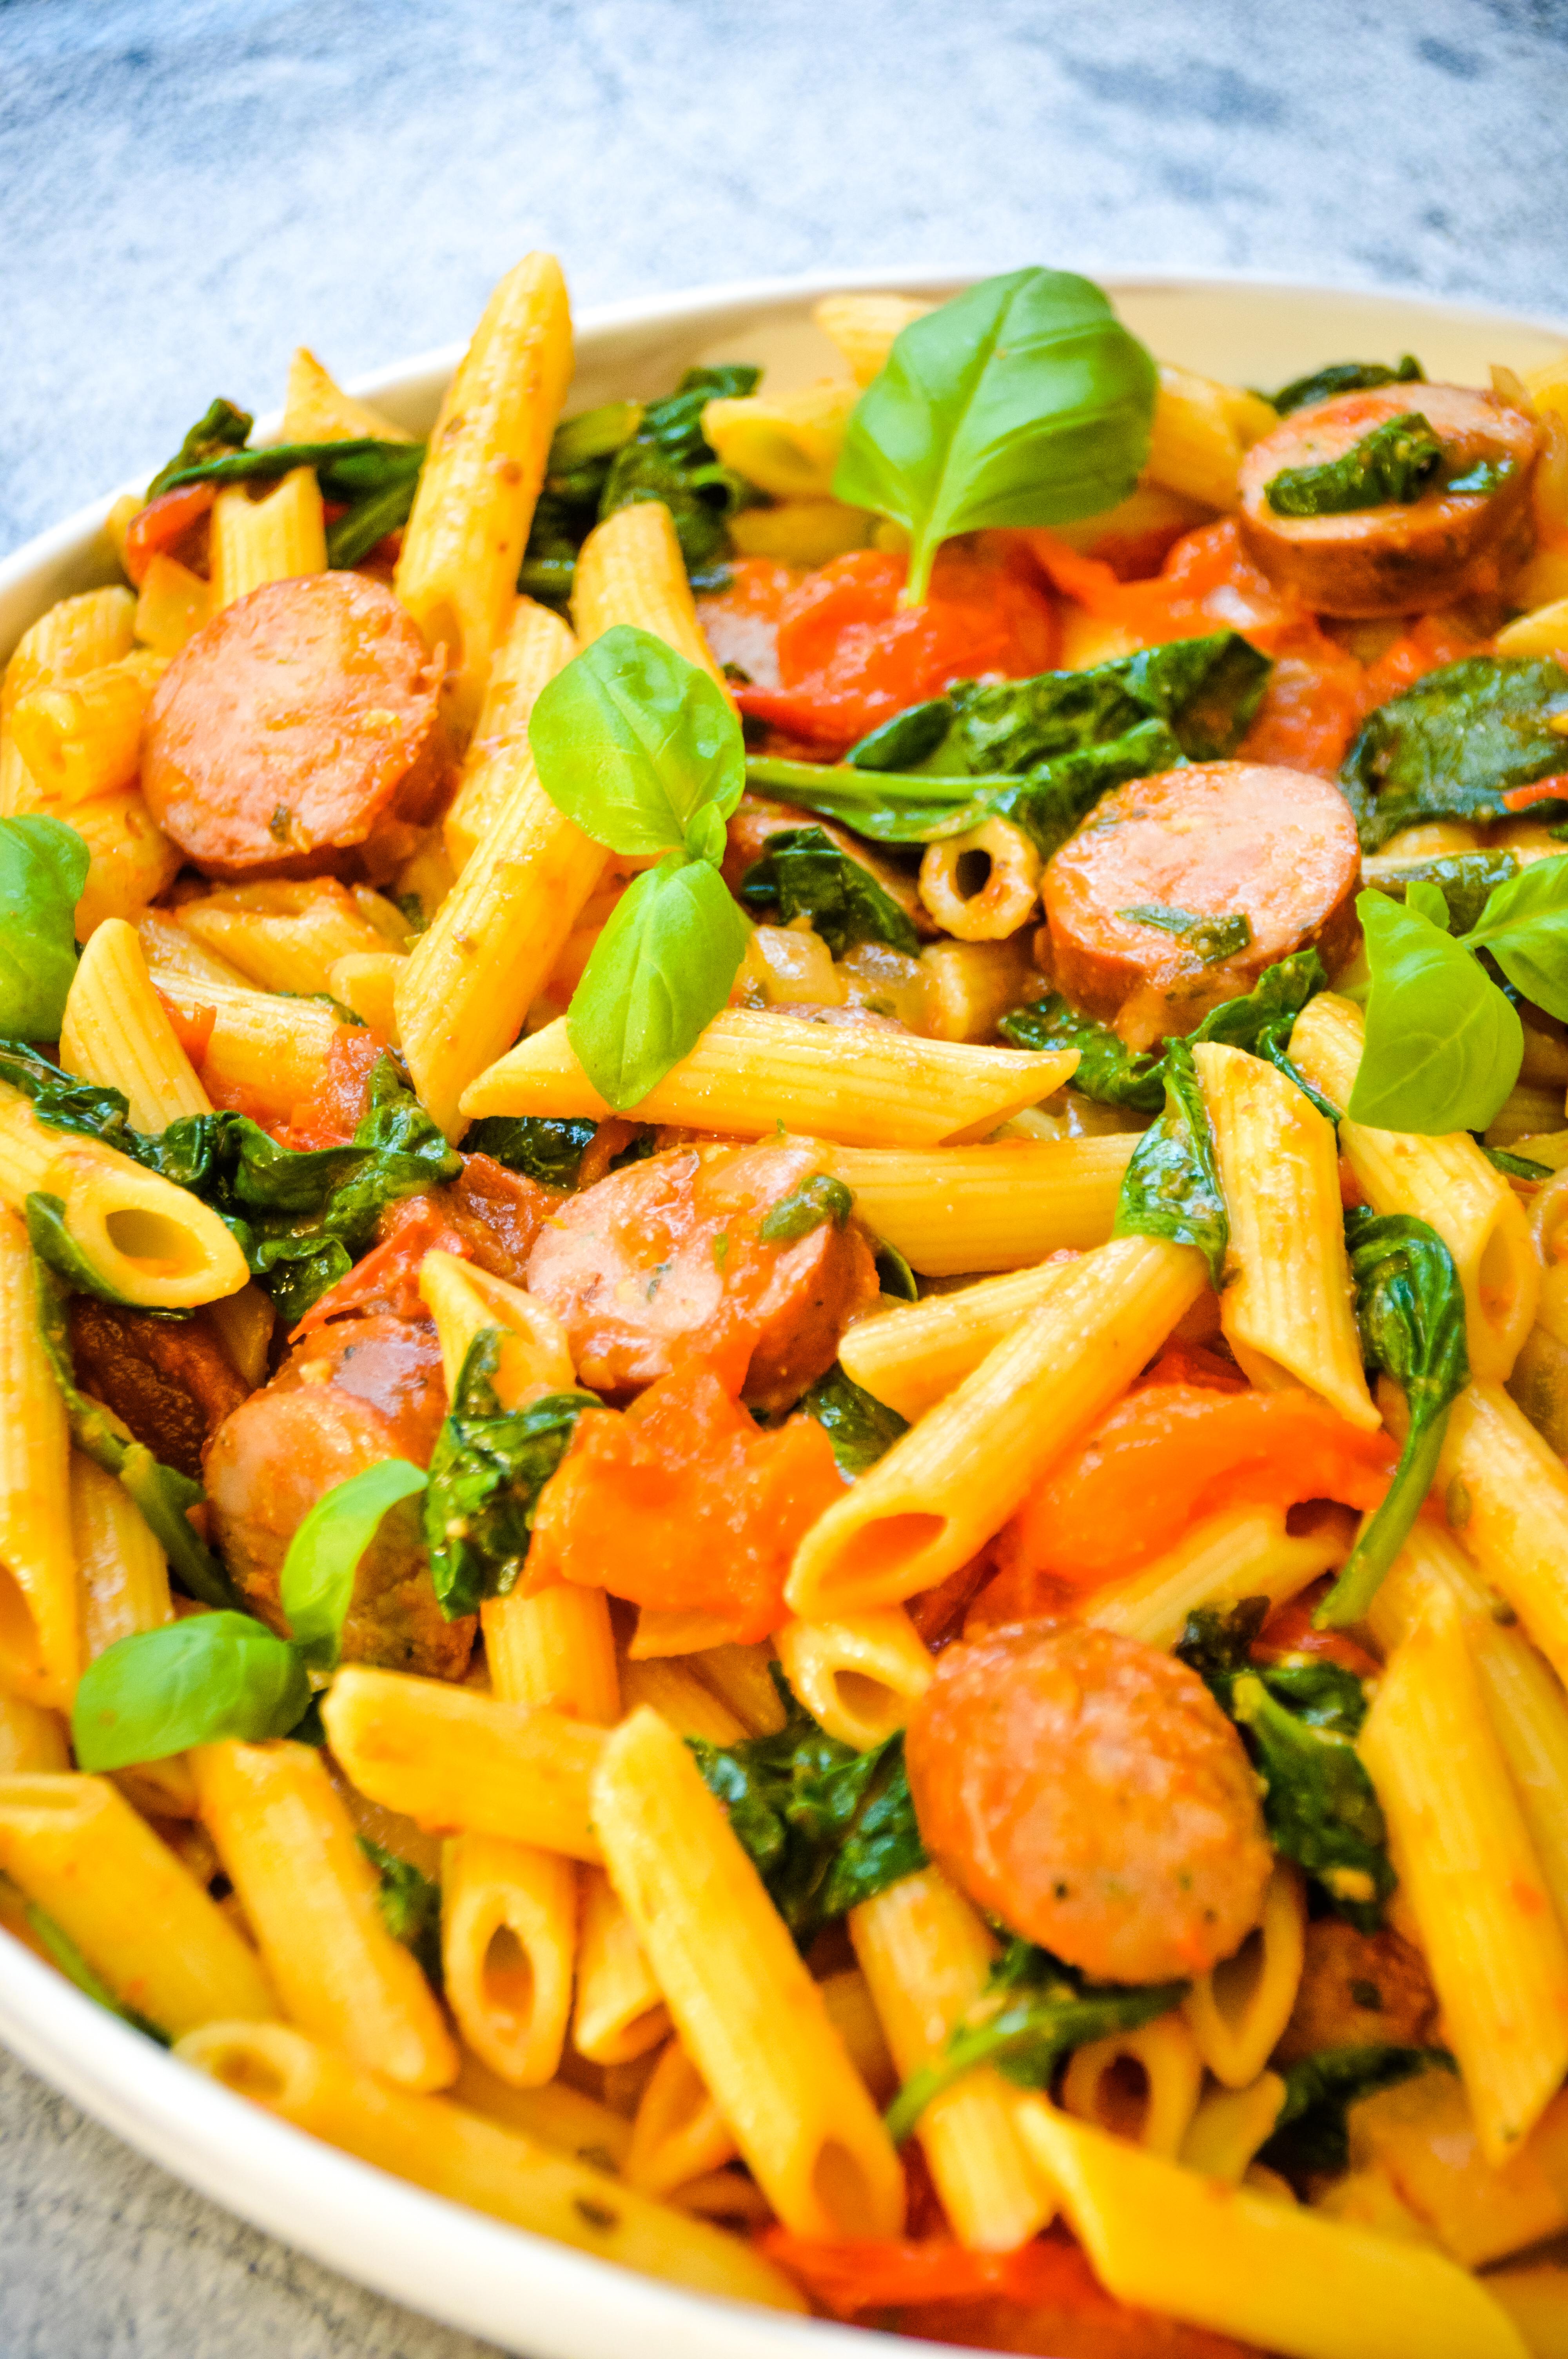 Easy Tomato Spinach & Sausage Pasta